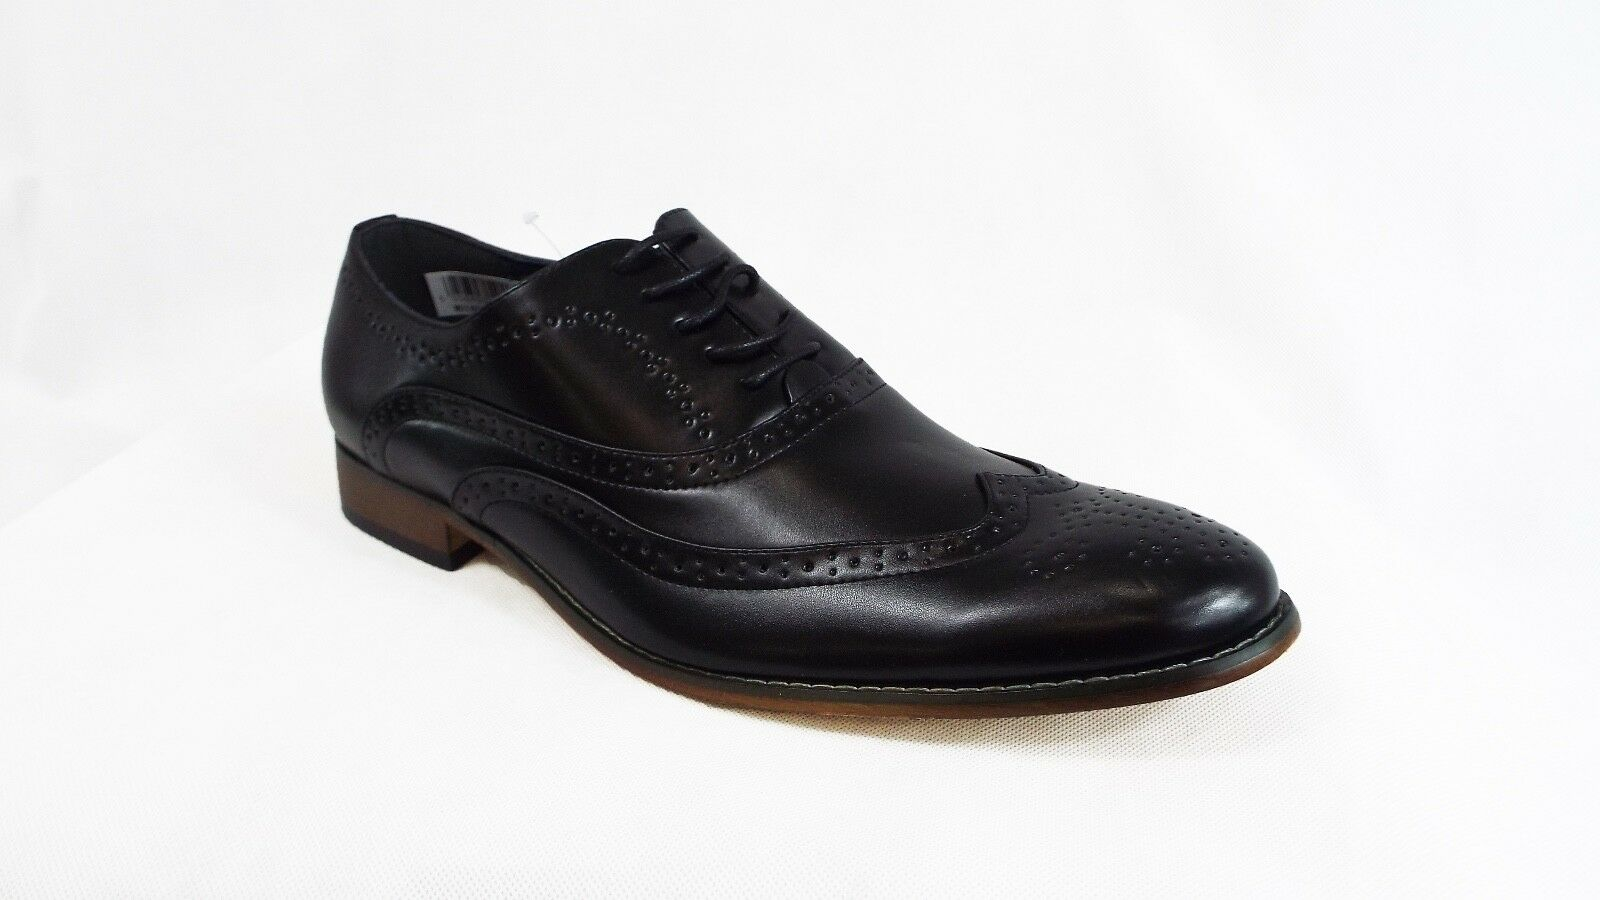 Mens Shoes Black Brogue Shoes Mens Wedding Formal Smart Casual 044392